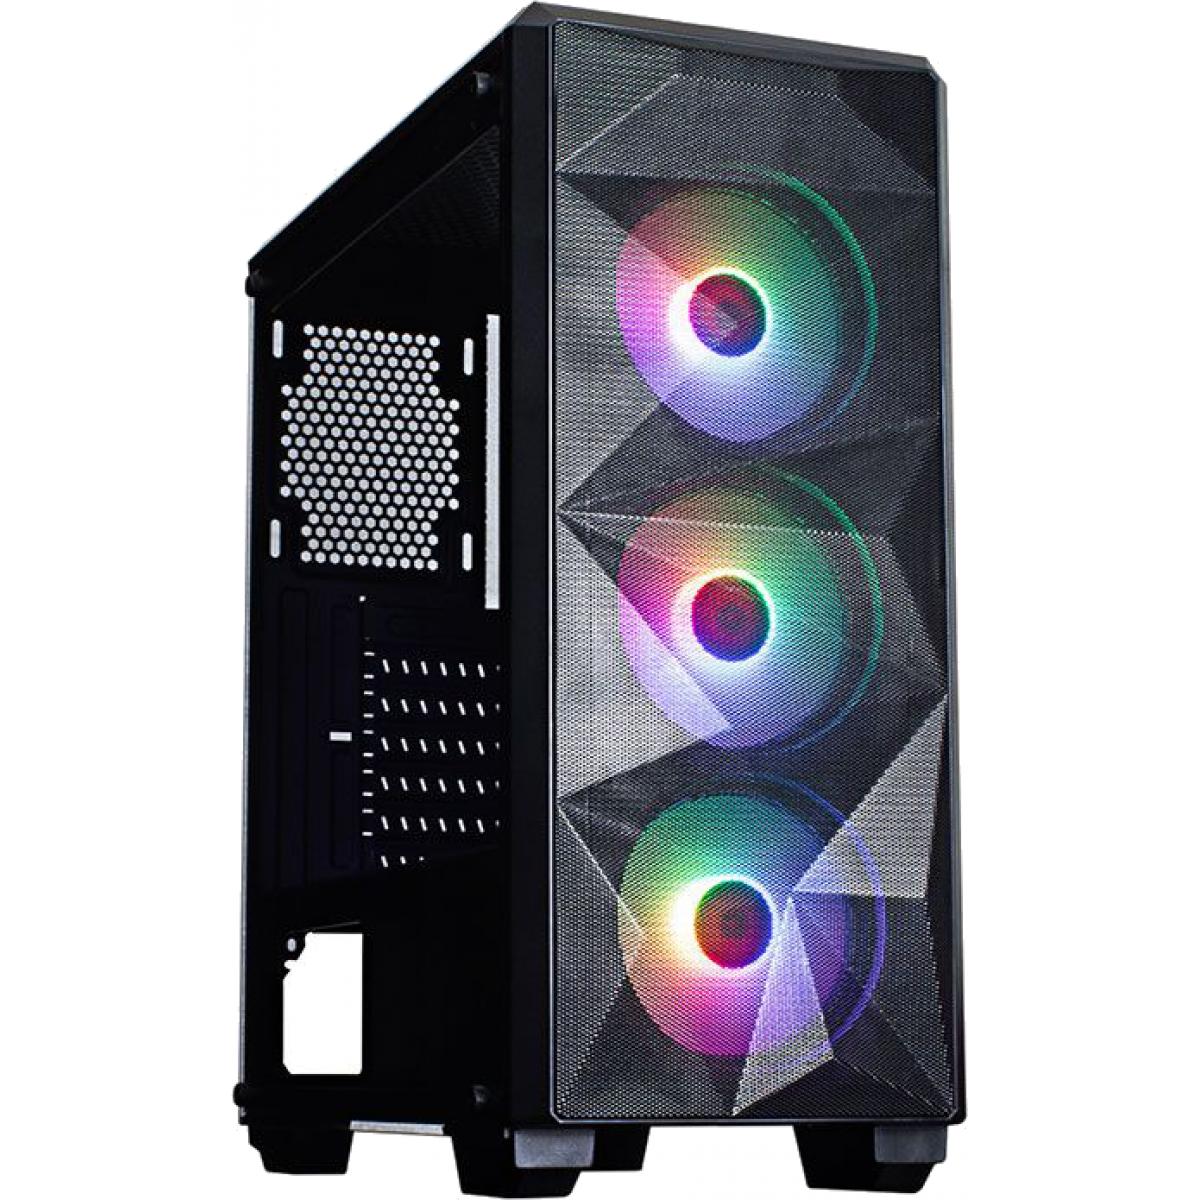 Pc Gamer Tera Edition AMD Ryzen 5 3600 / Radeon RX 5500 XT 8GB / DDR4 8GB / HD 1TB / 600W